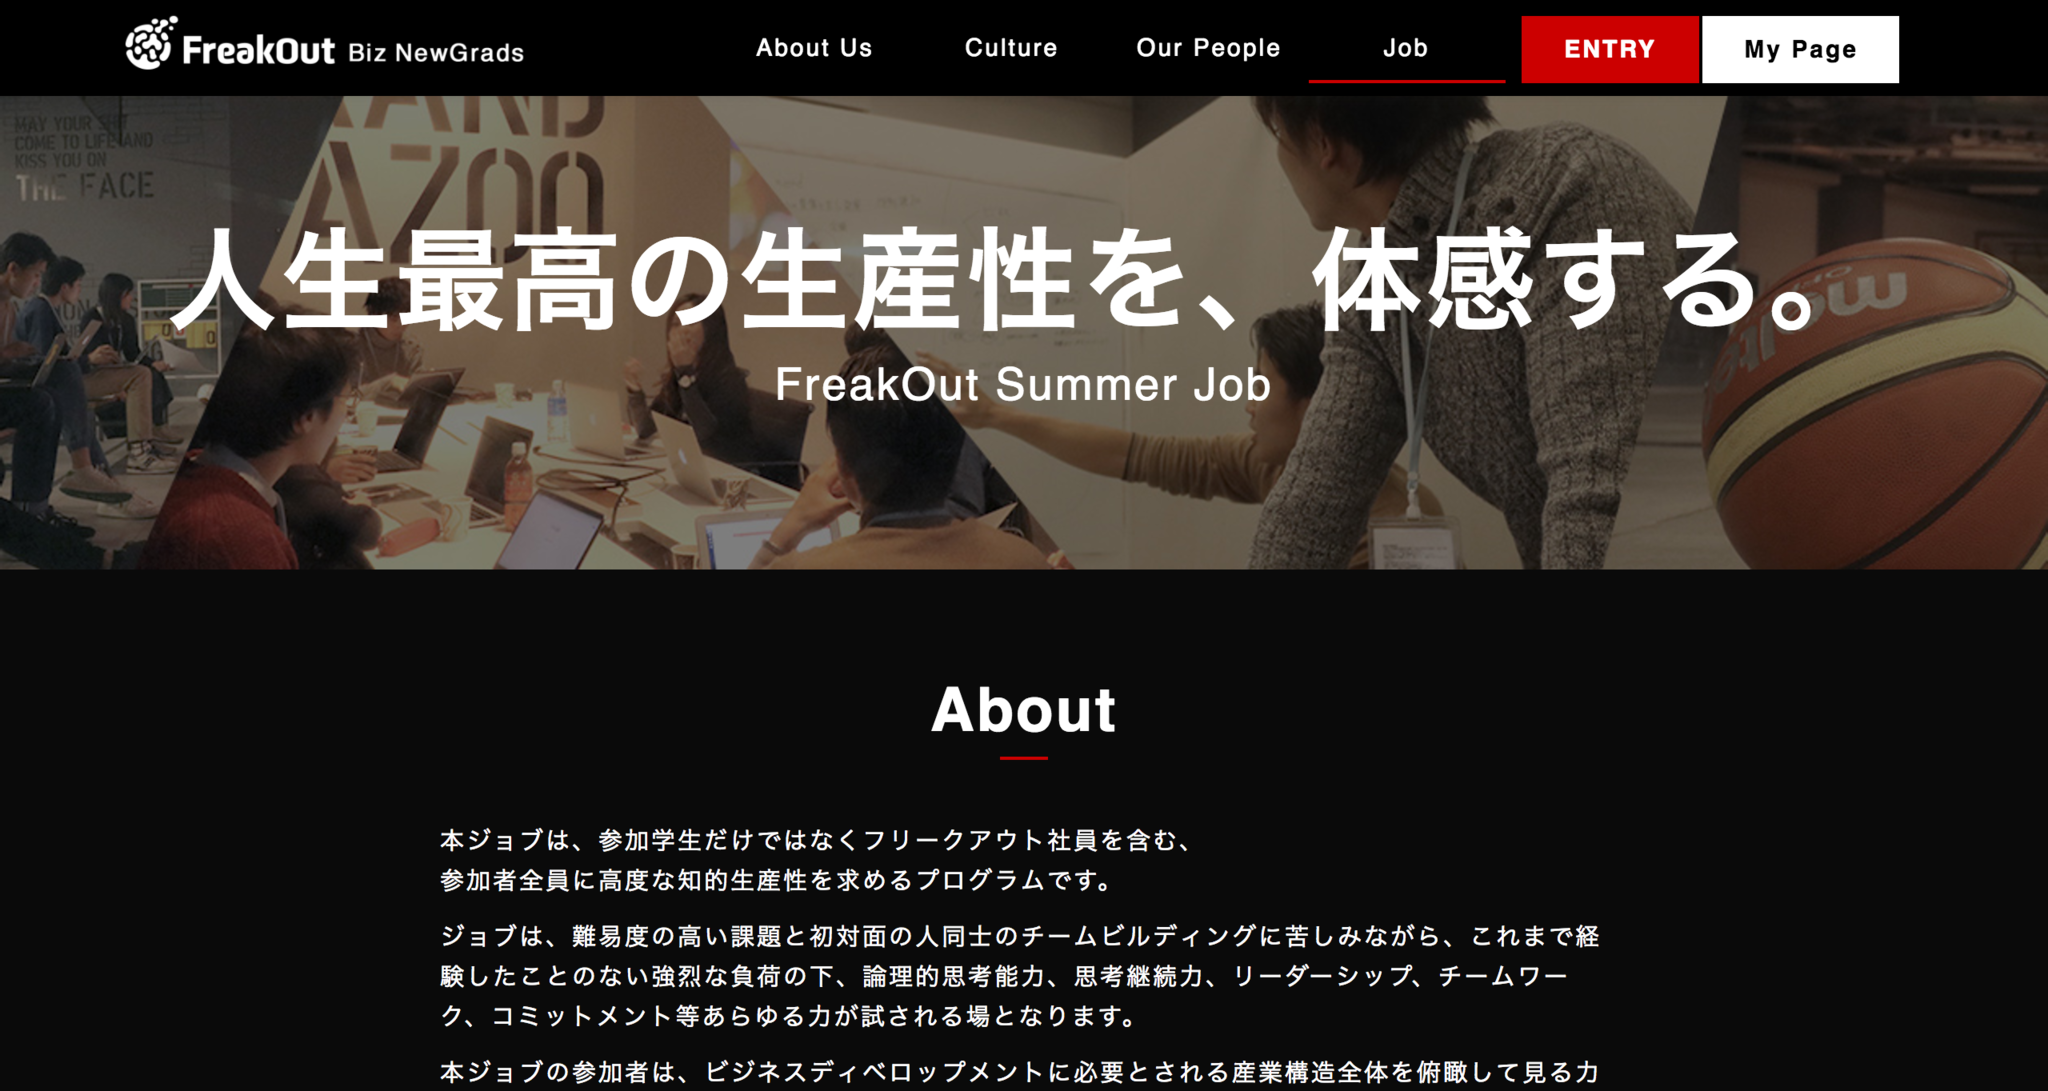 FreakOut_Biz_NewGrads_フリークアウト_ビジネス職新卒採用サイト_»_Job.png